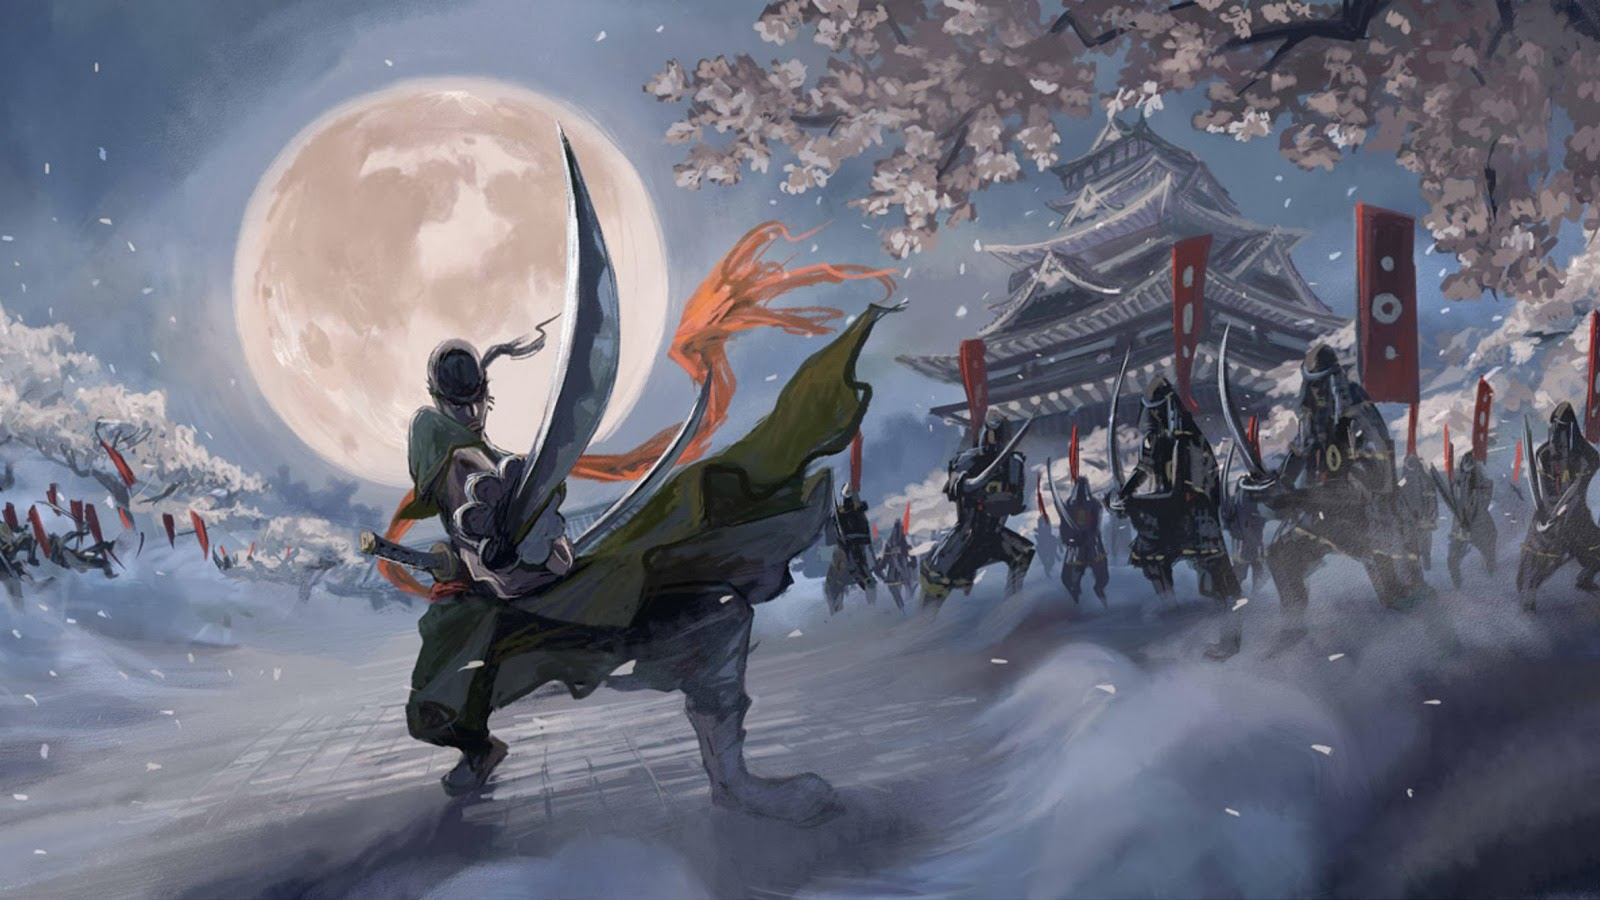 roronoa zoro samurai one piece 24 wallpaper hd